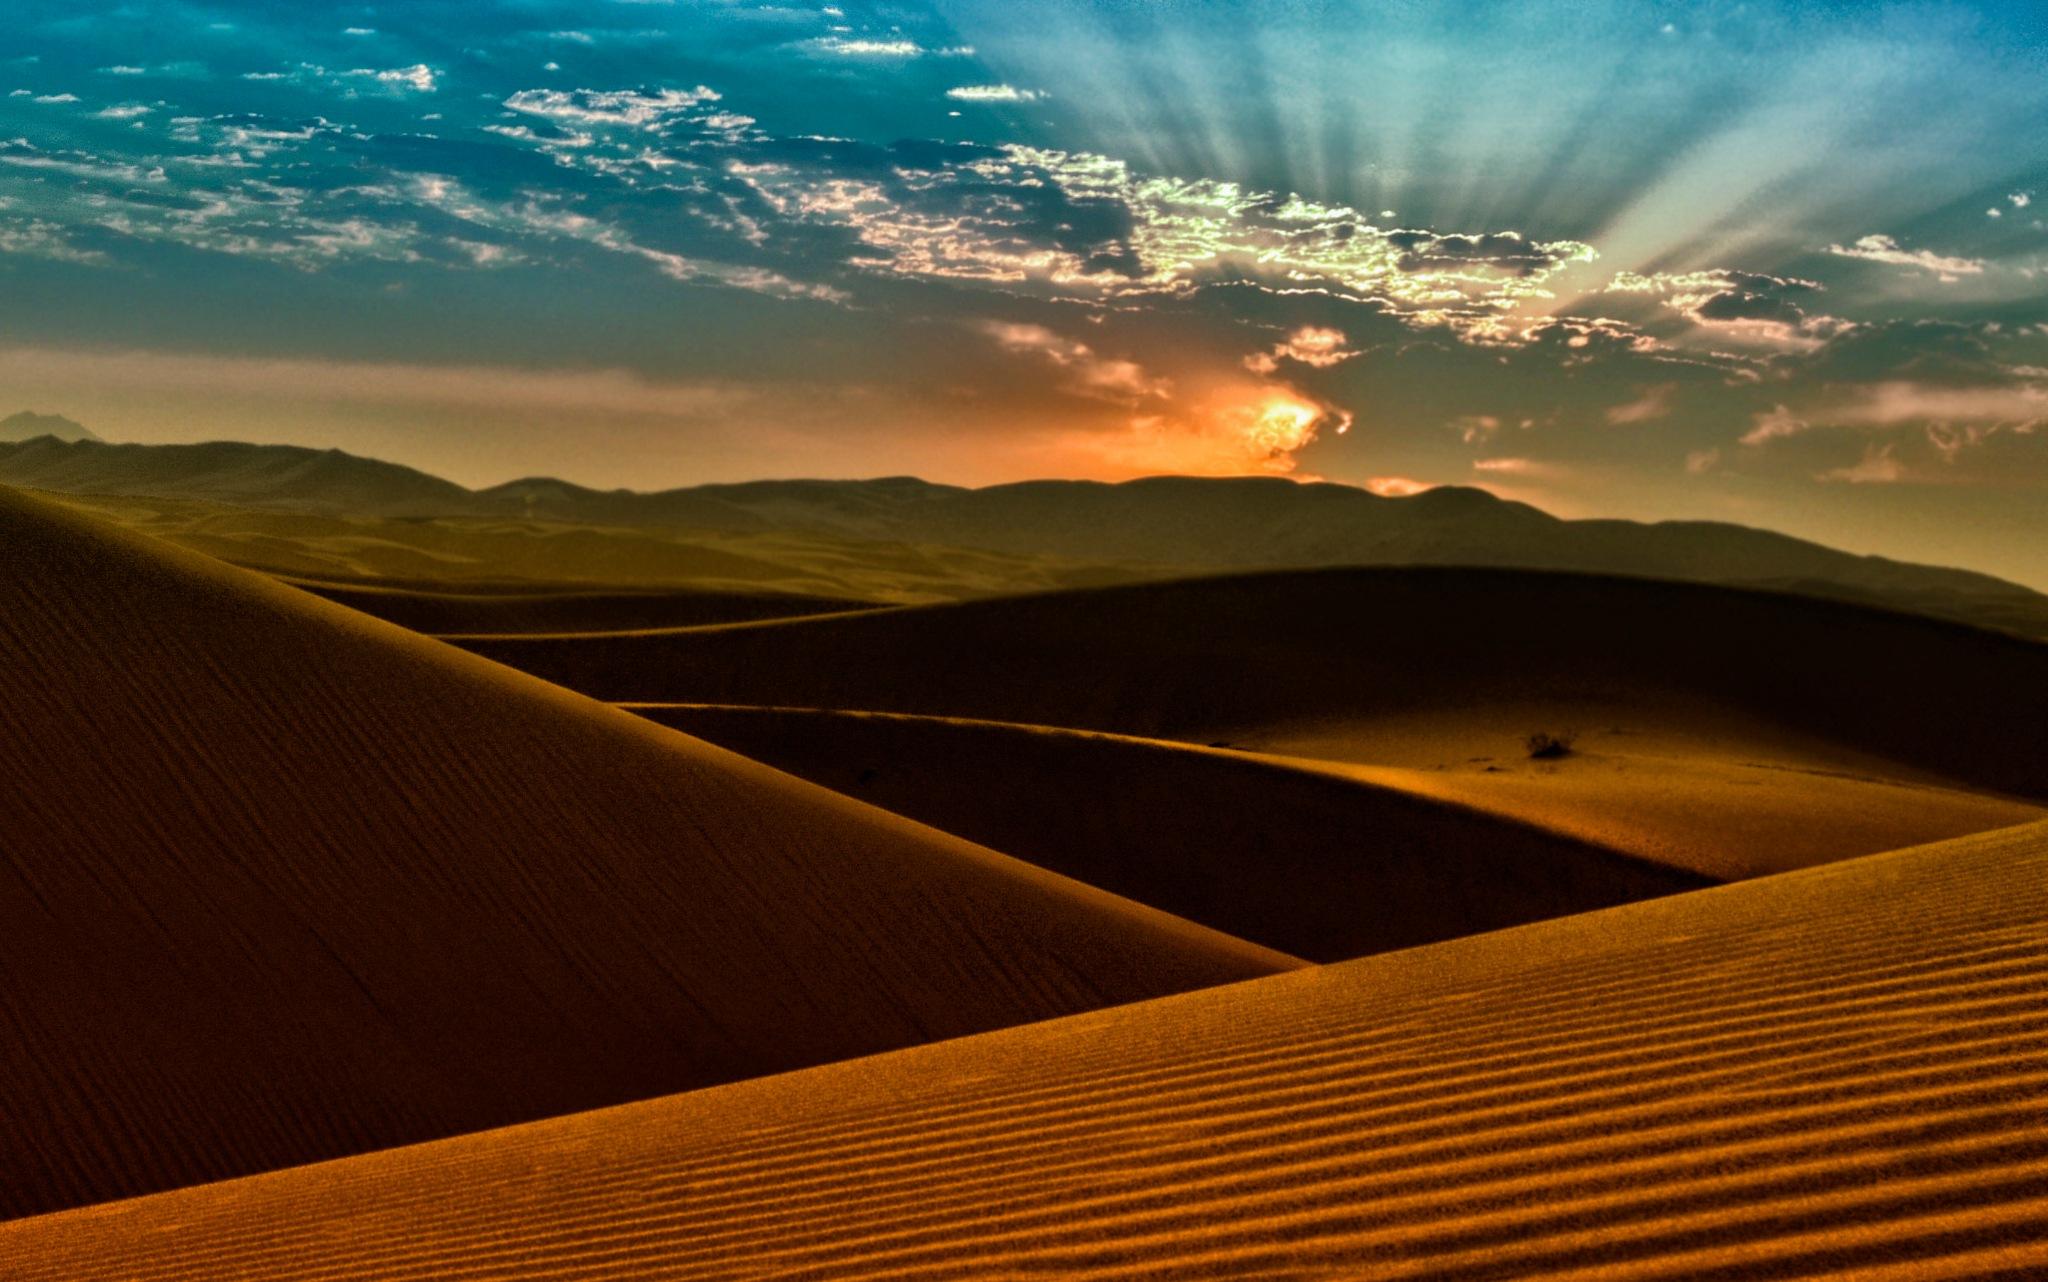 Maranjab desert by HamedEsmaeili